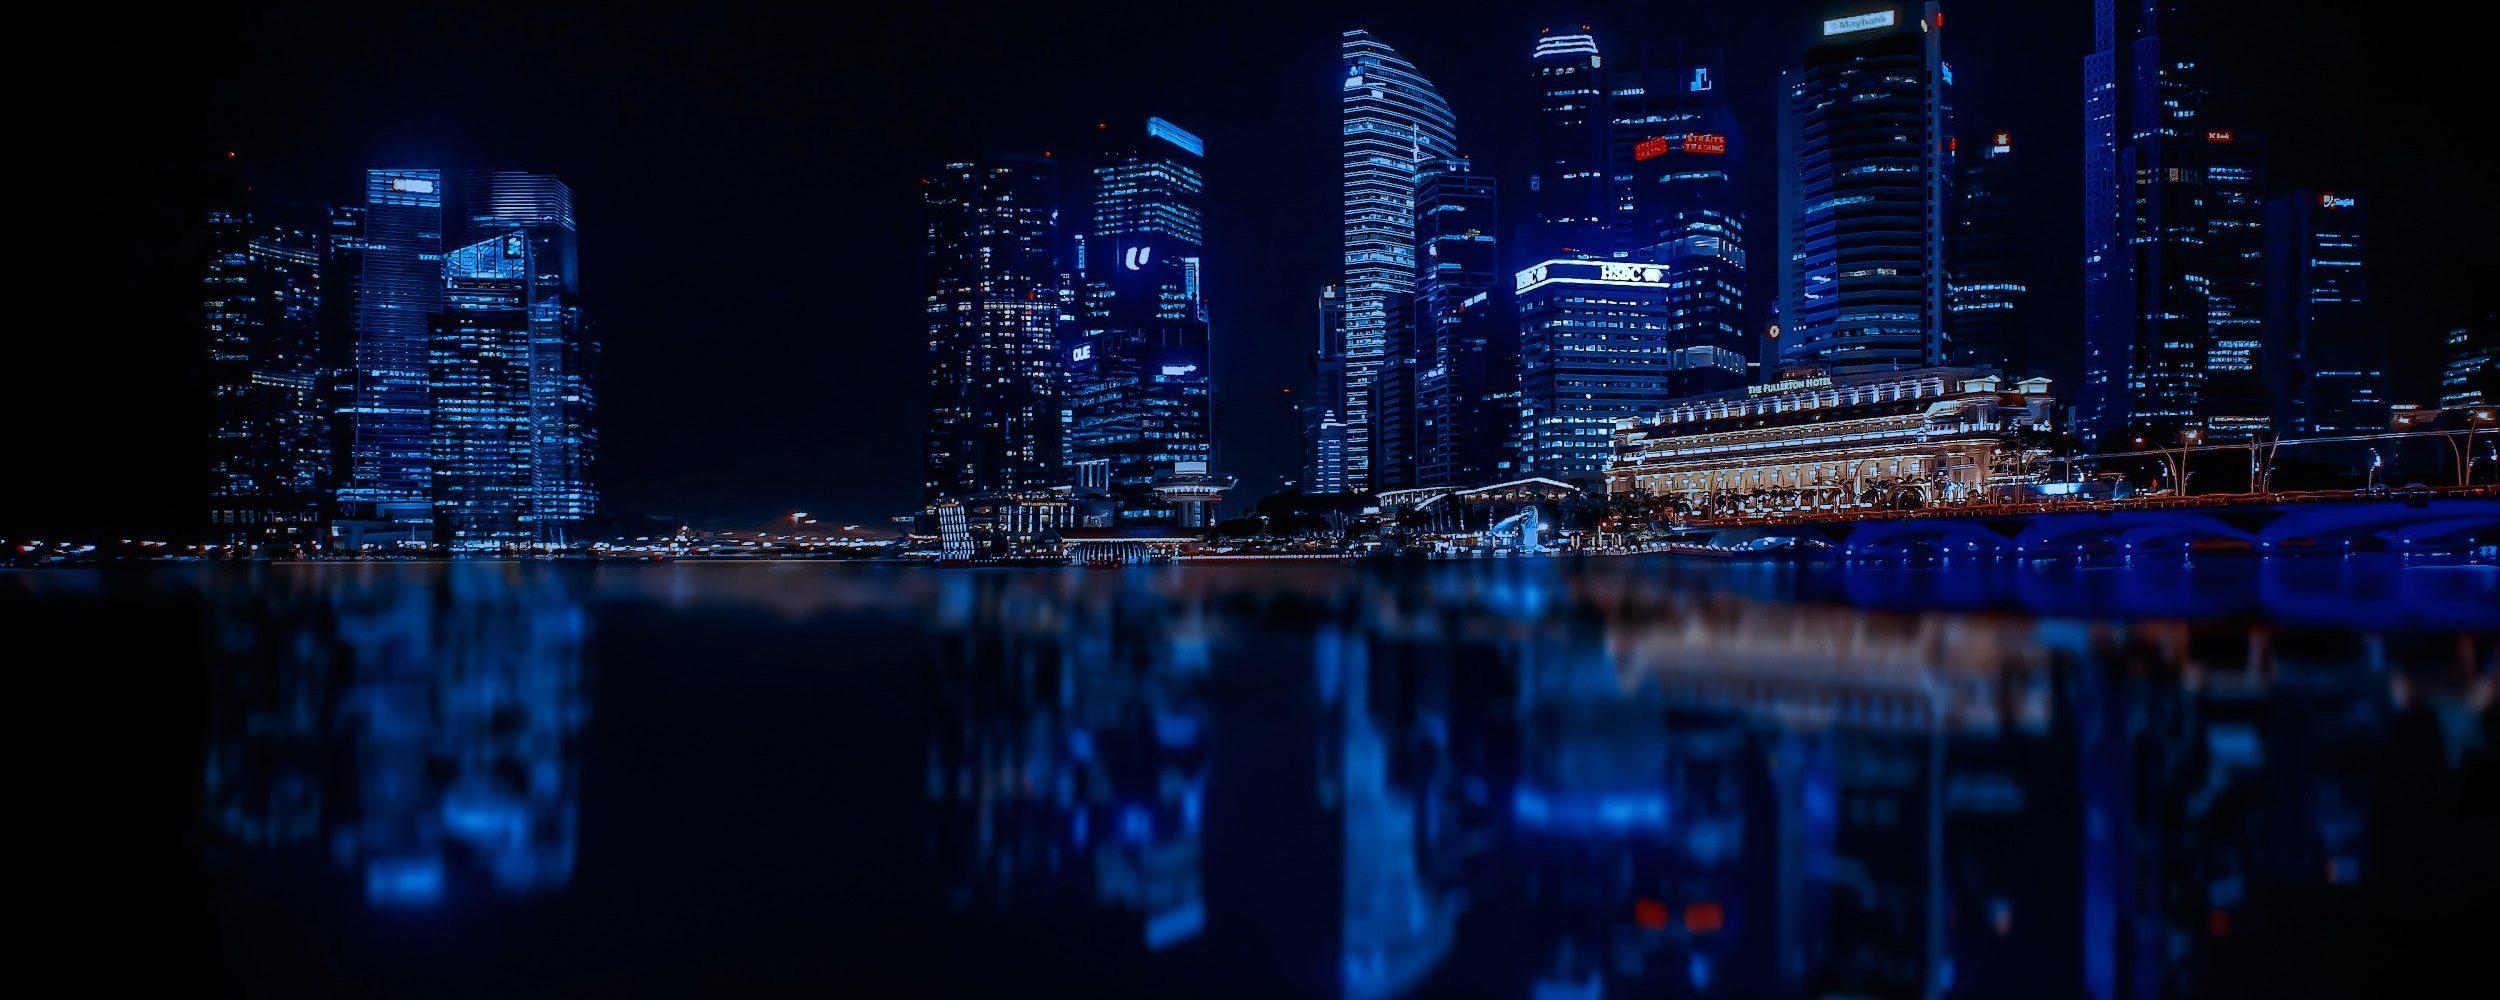 Per i Google Pixel più AI negli scatti notturni